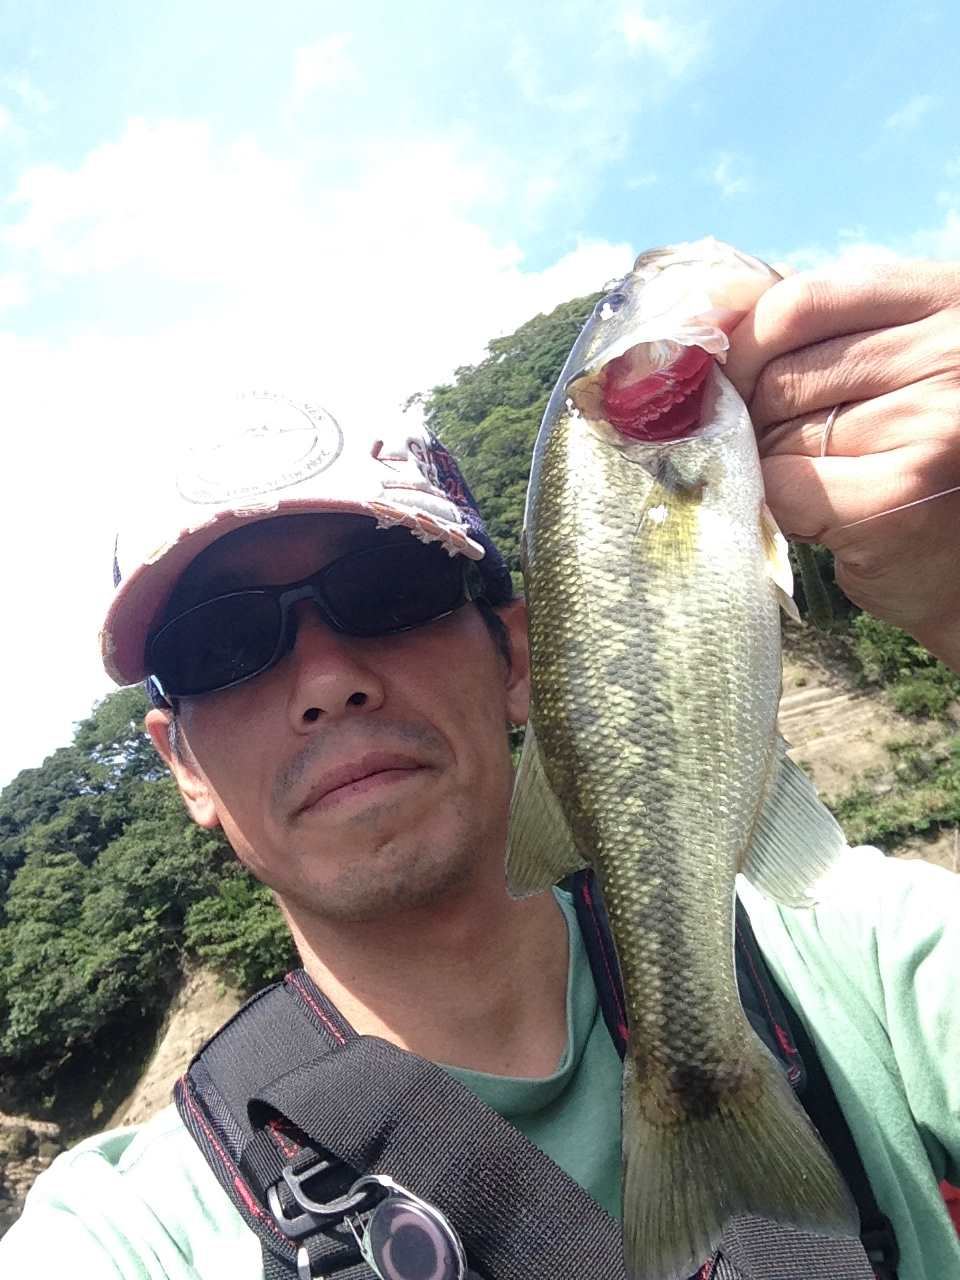 2014-09-03 13.16.54_R.jpg